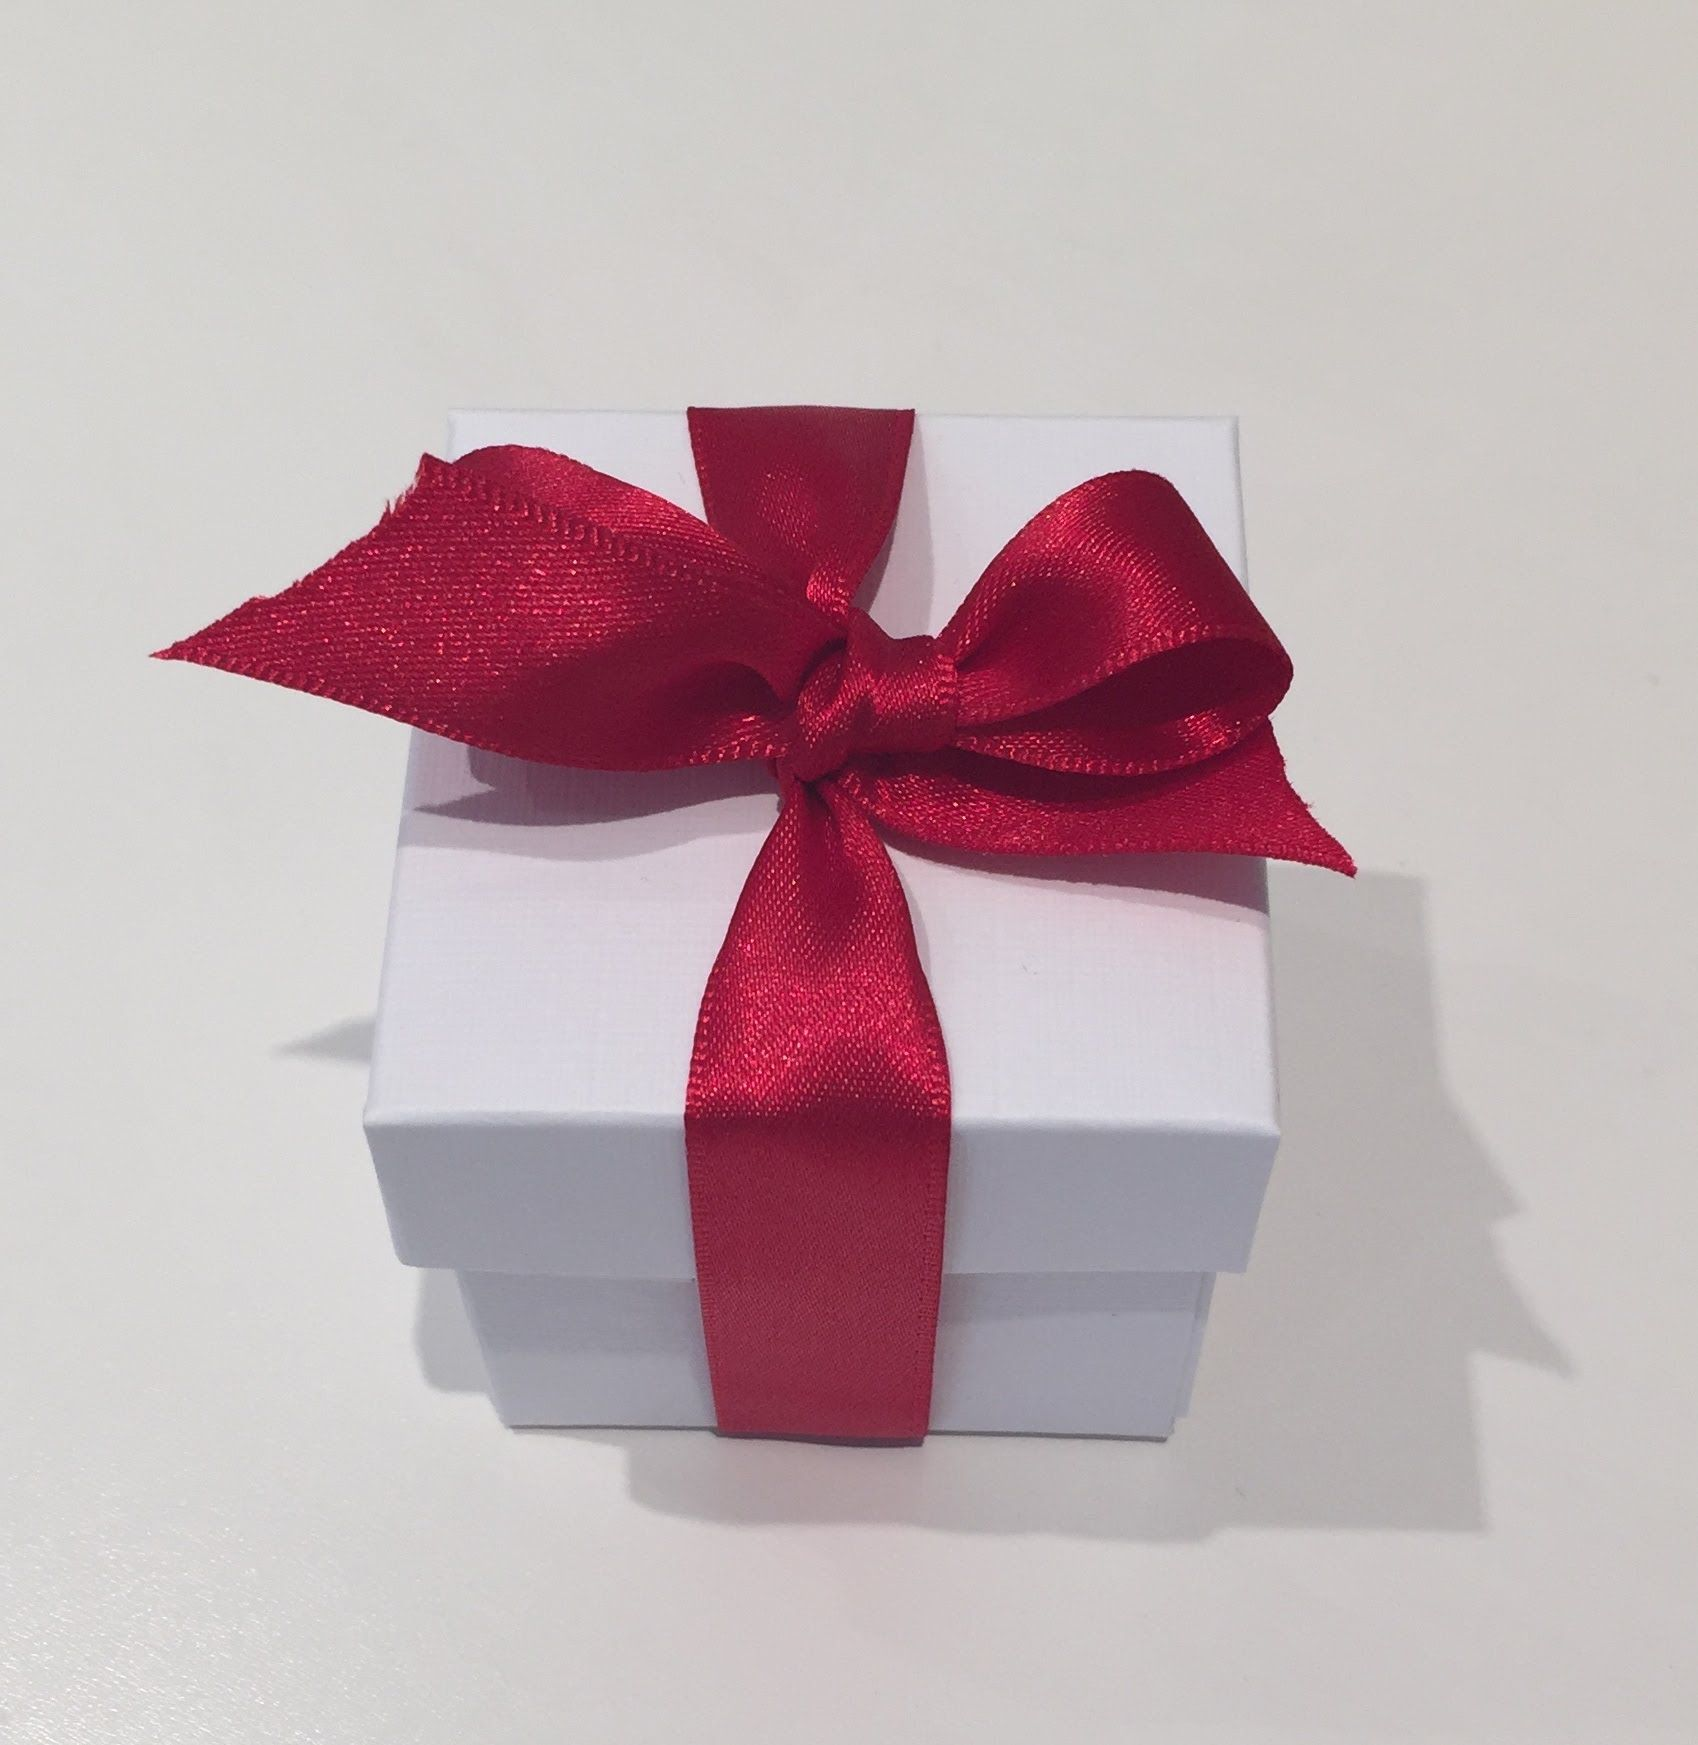 How To Make A 2inch Square Gift Box Diy Box Crafts Big Gift Boxes Diy Gift Box